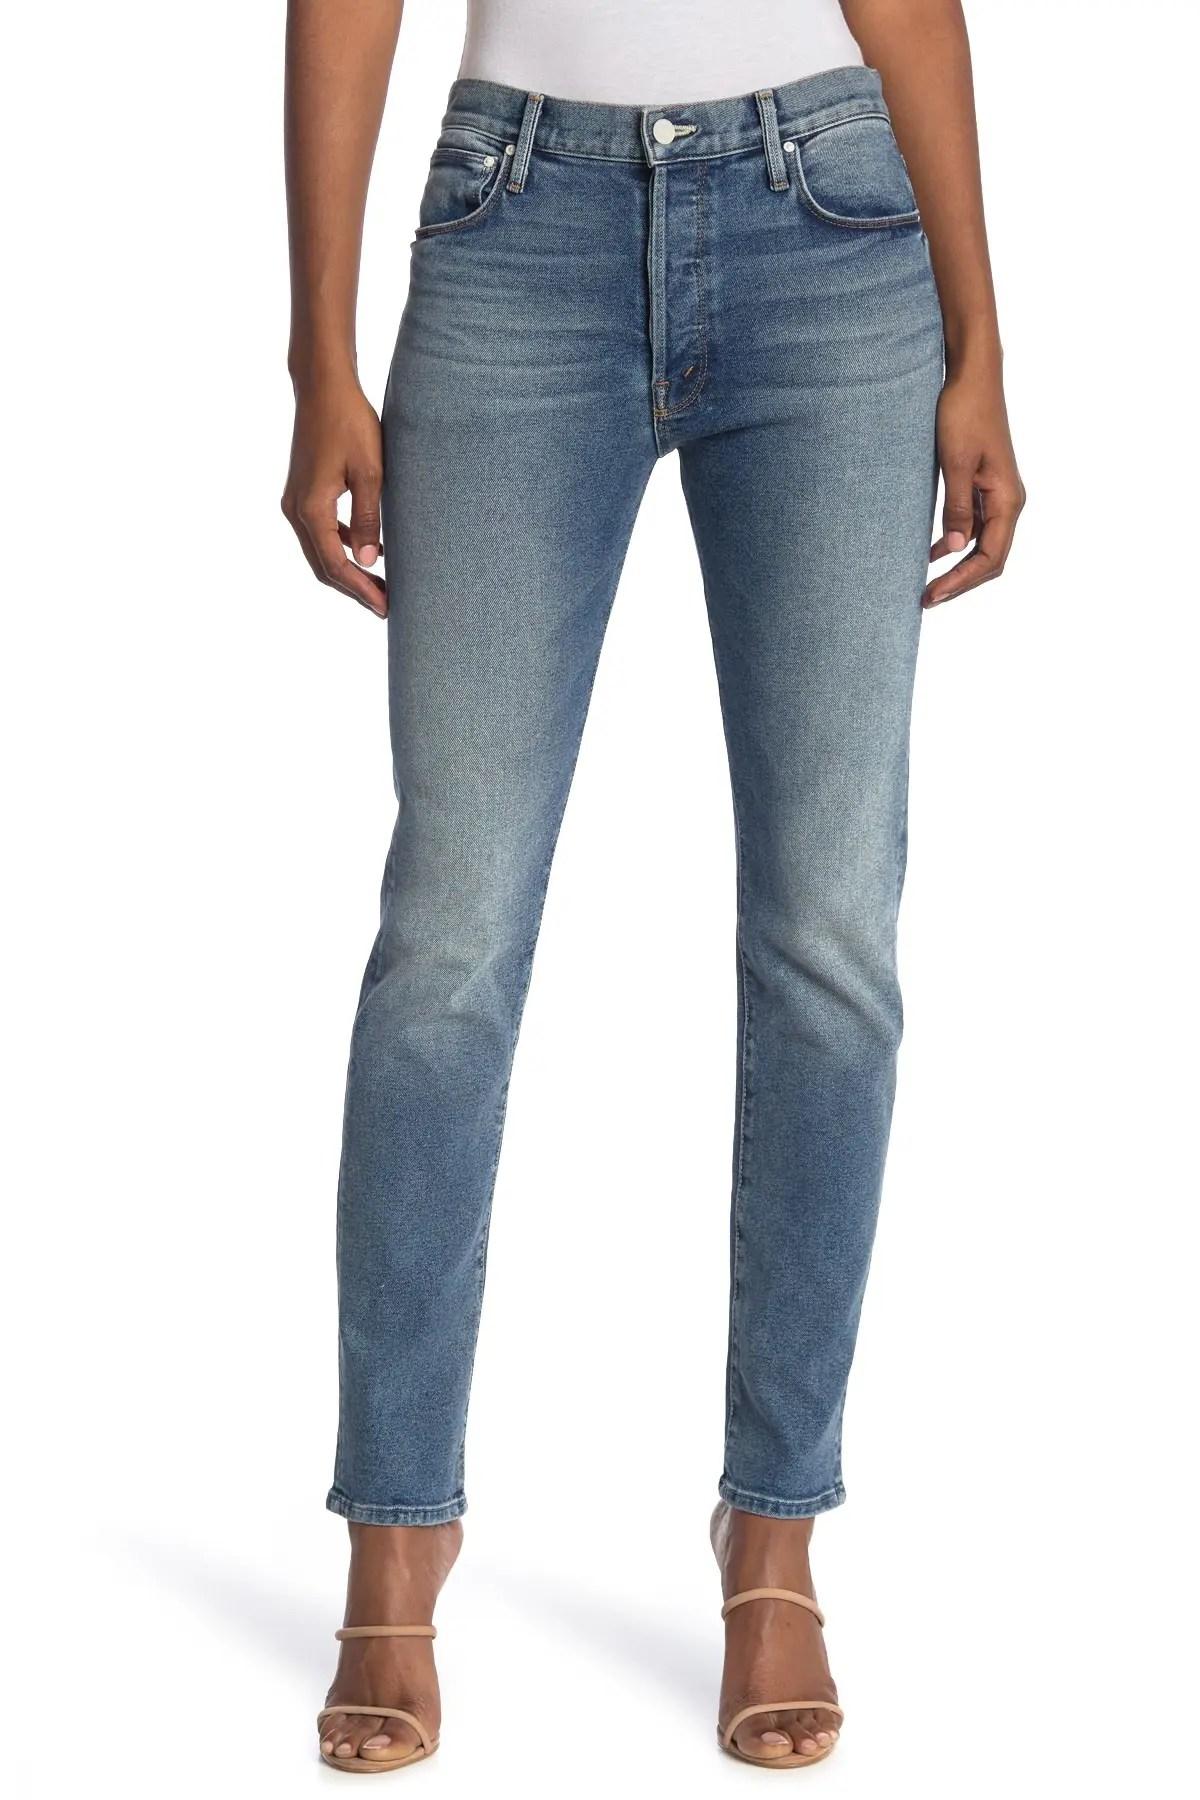 the proper skinny jeans